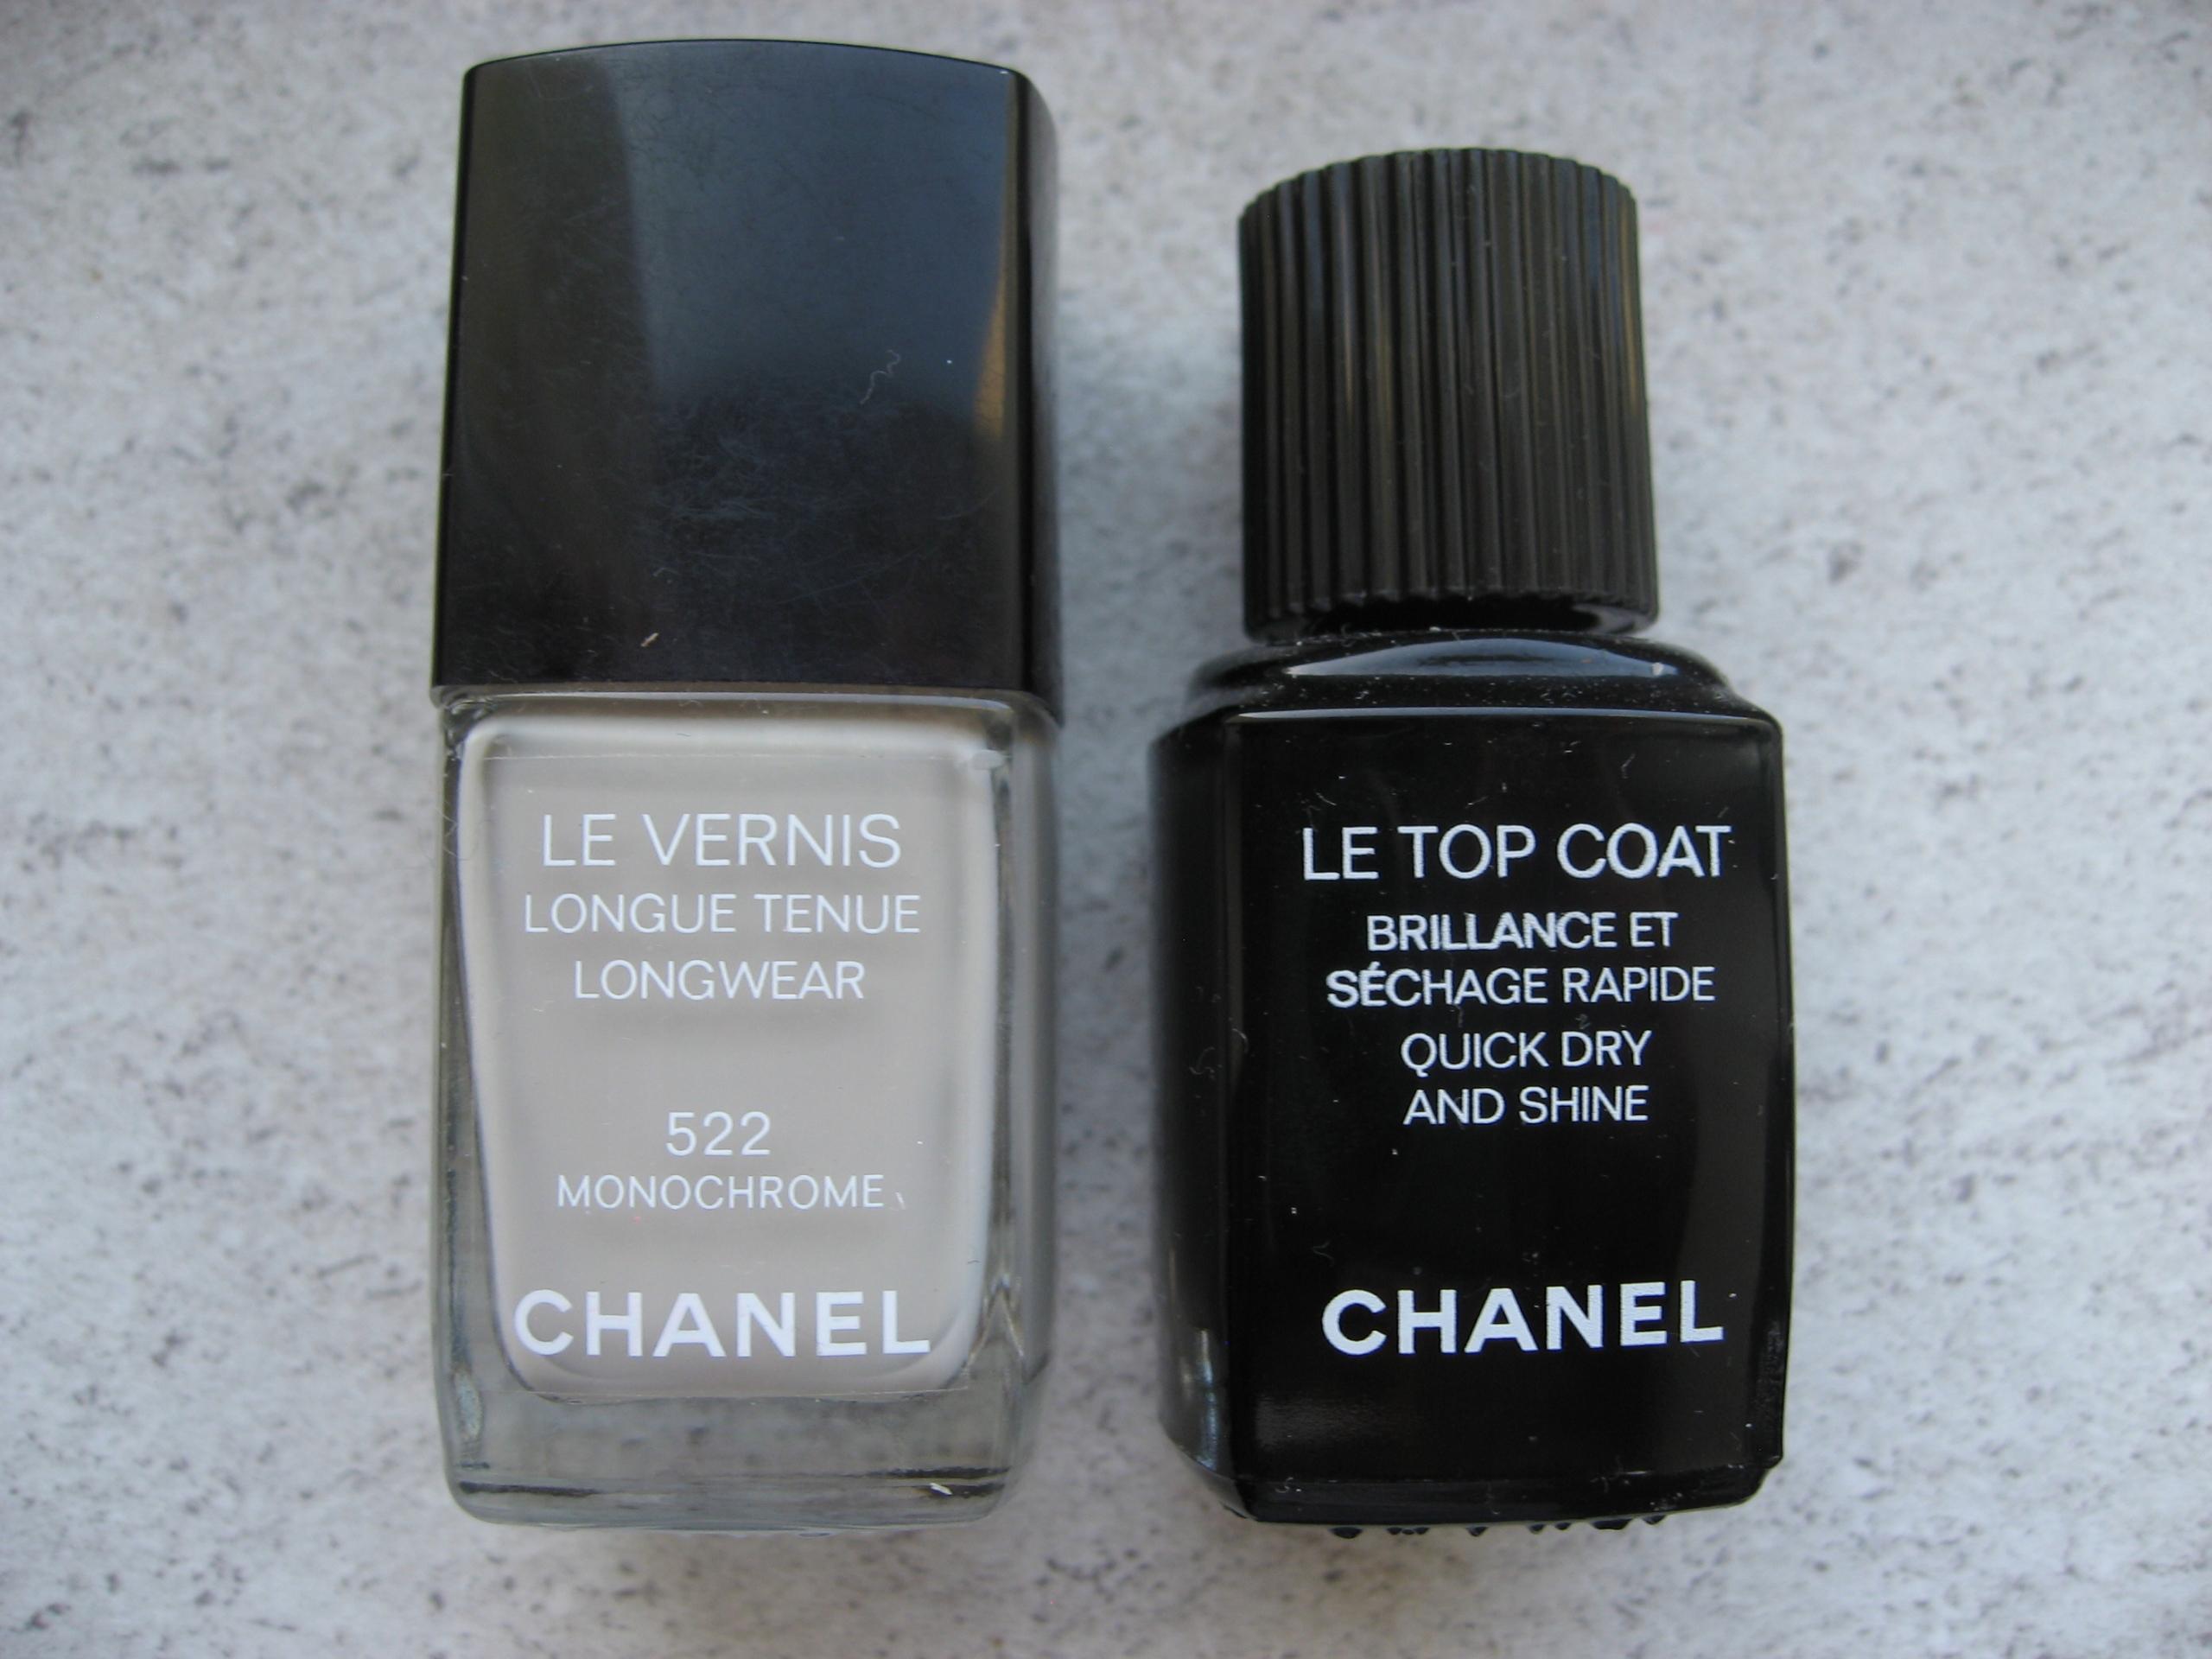 Chanel Le Vernis 522 + Le Top Coat lakiery zestaw